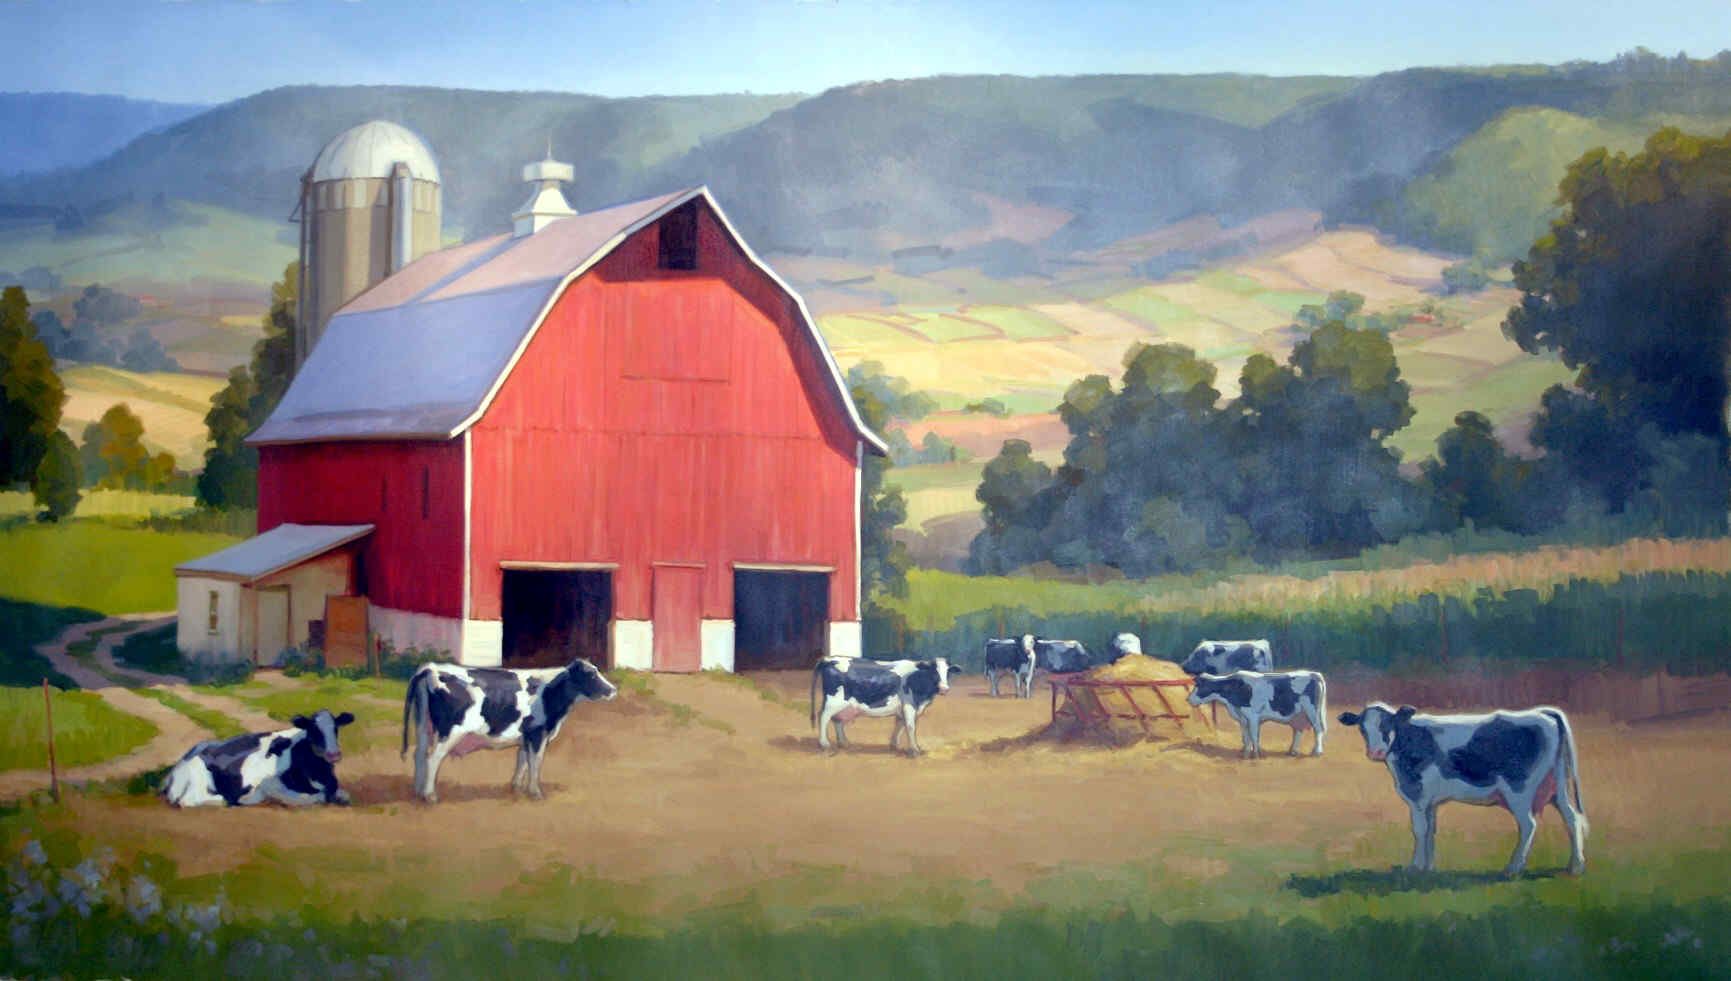 Download Farm Barn Cows Fields Hills Pasture Red Wallpaper 1731x981